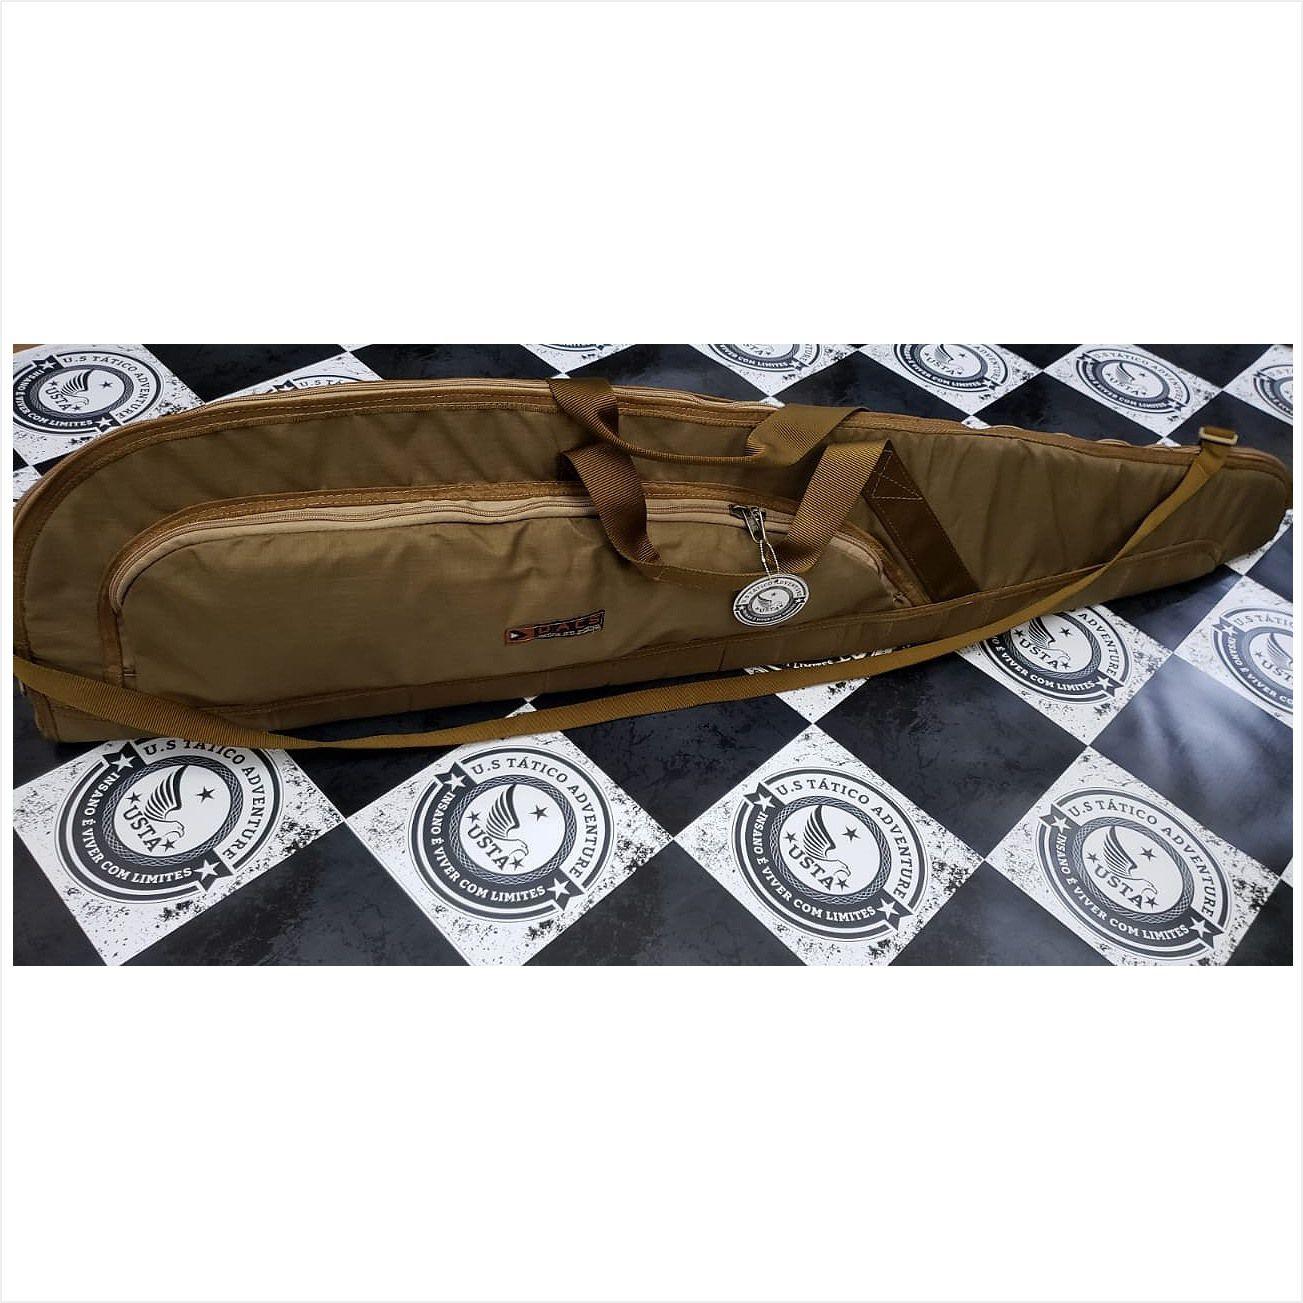 Capa Case P/ Arma E Aeg Airsoft Luxo 116 Cordura COYOTE Dacs